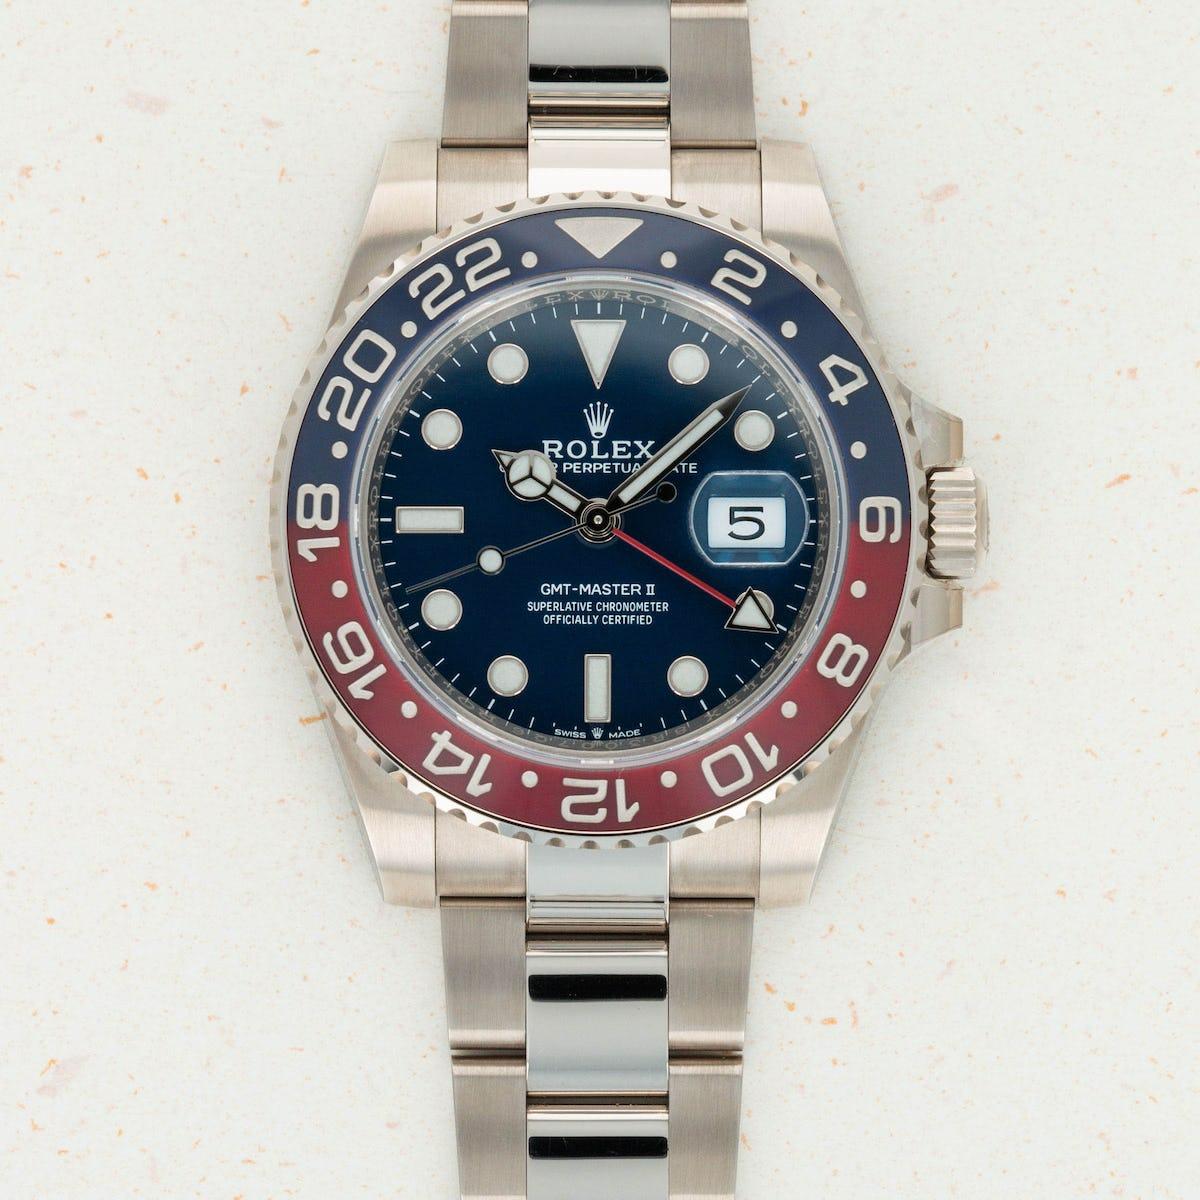 Thumbnail for Rolex White Gold GMT-Master II 126719BLRO